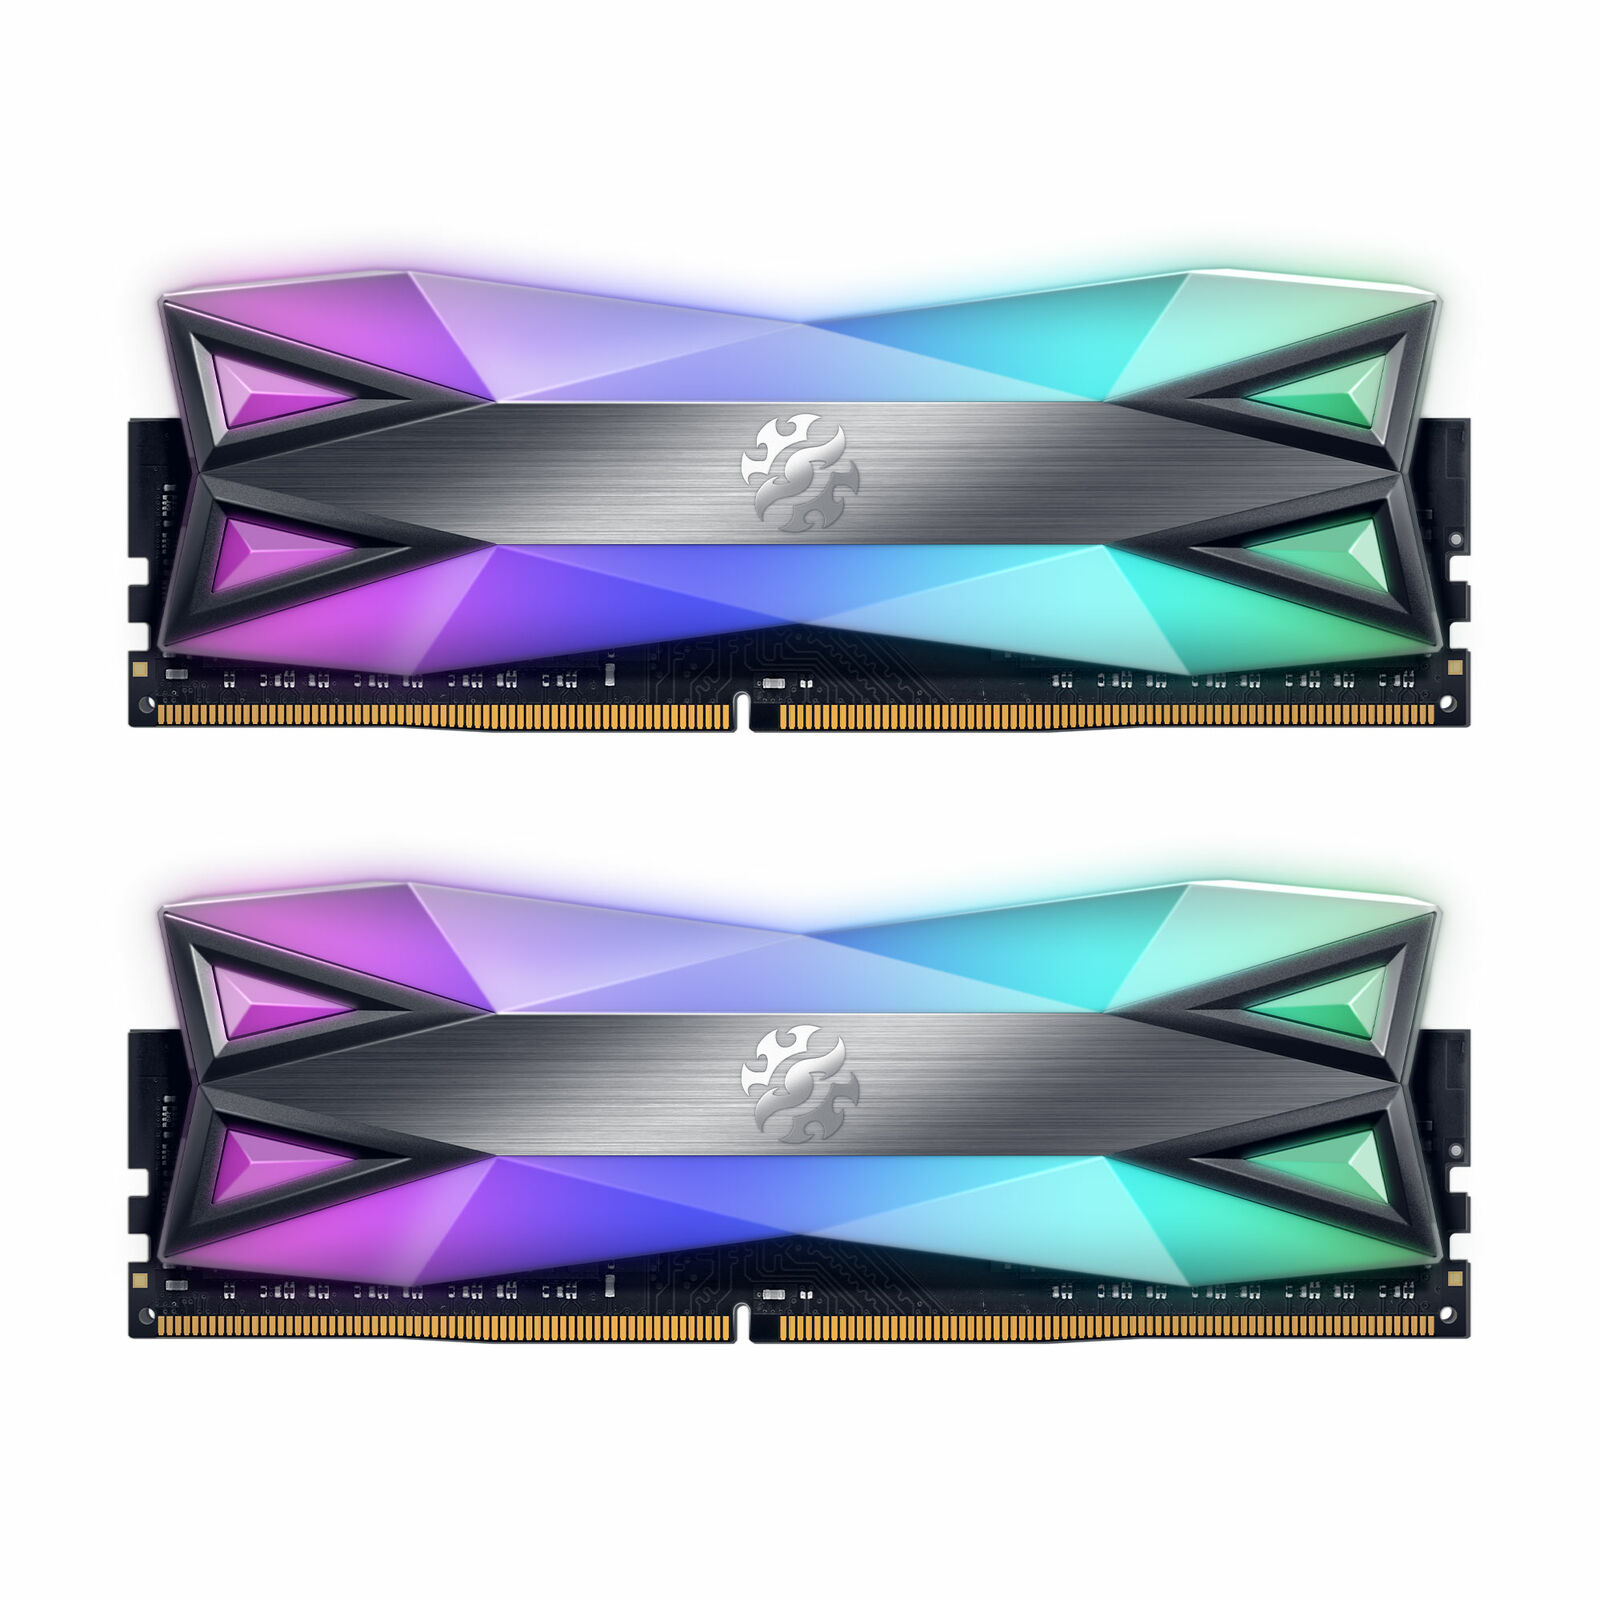 XPG SPECTRIX D60 RGB Desktop Memory: 32GB (2x16GB) DDR4 3200MHz CL16 GREY. Buy it now for 164.99